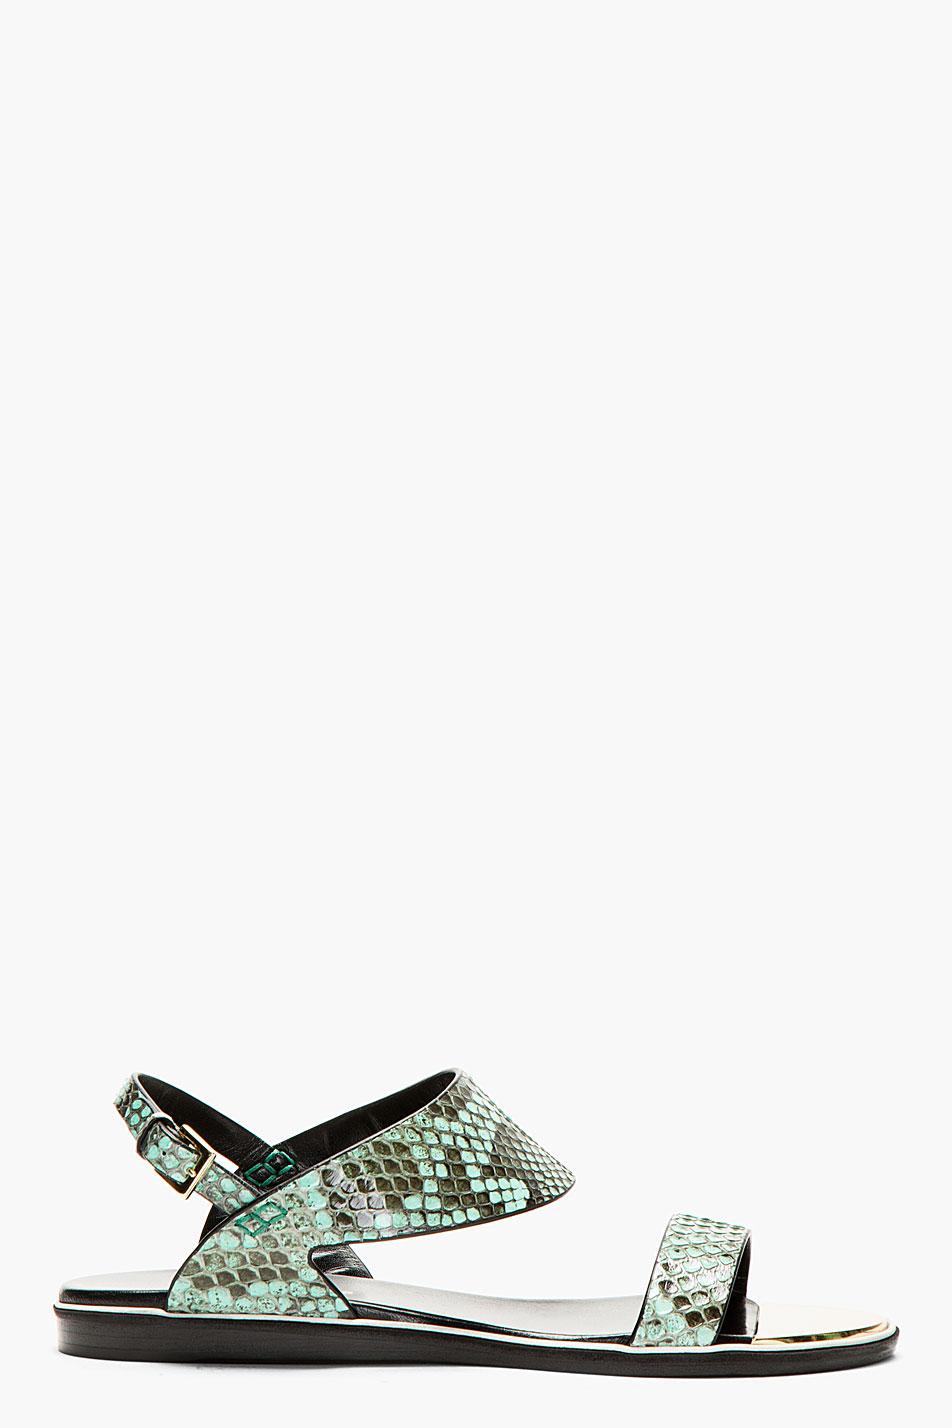 Nicholas kirkwood aqua python flat sandals